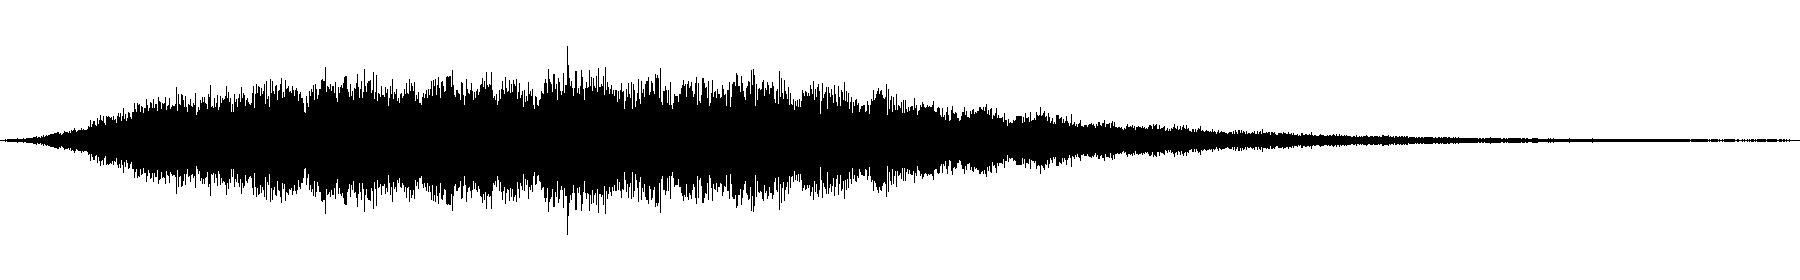 synth choir c